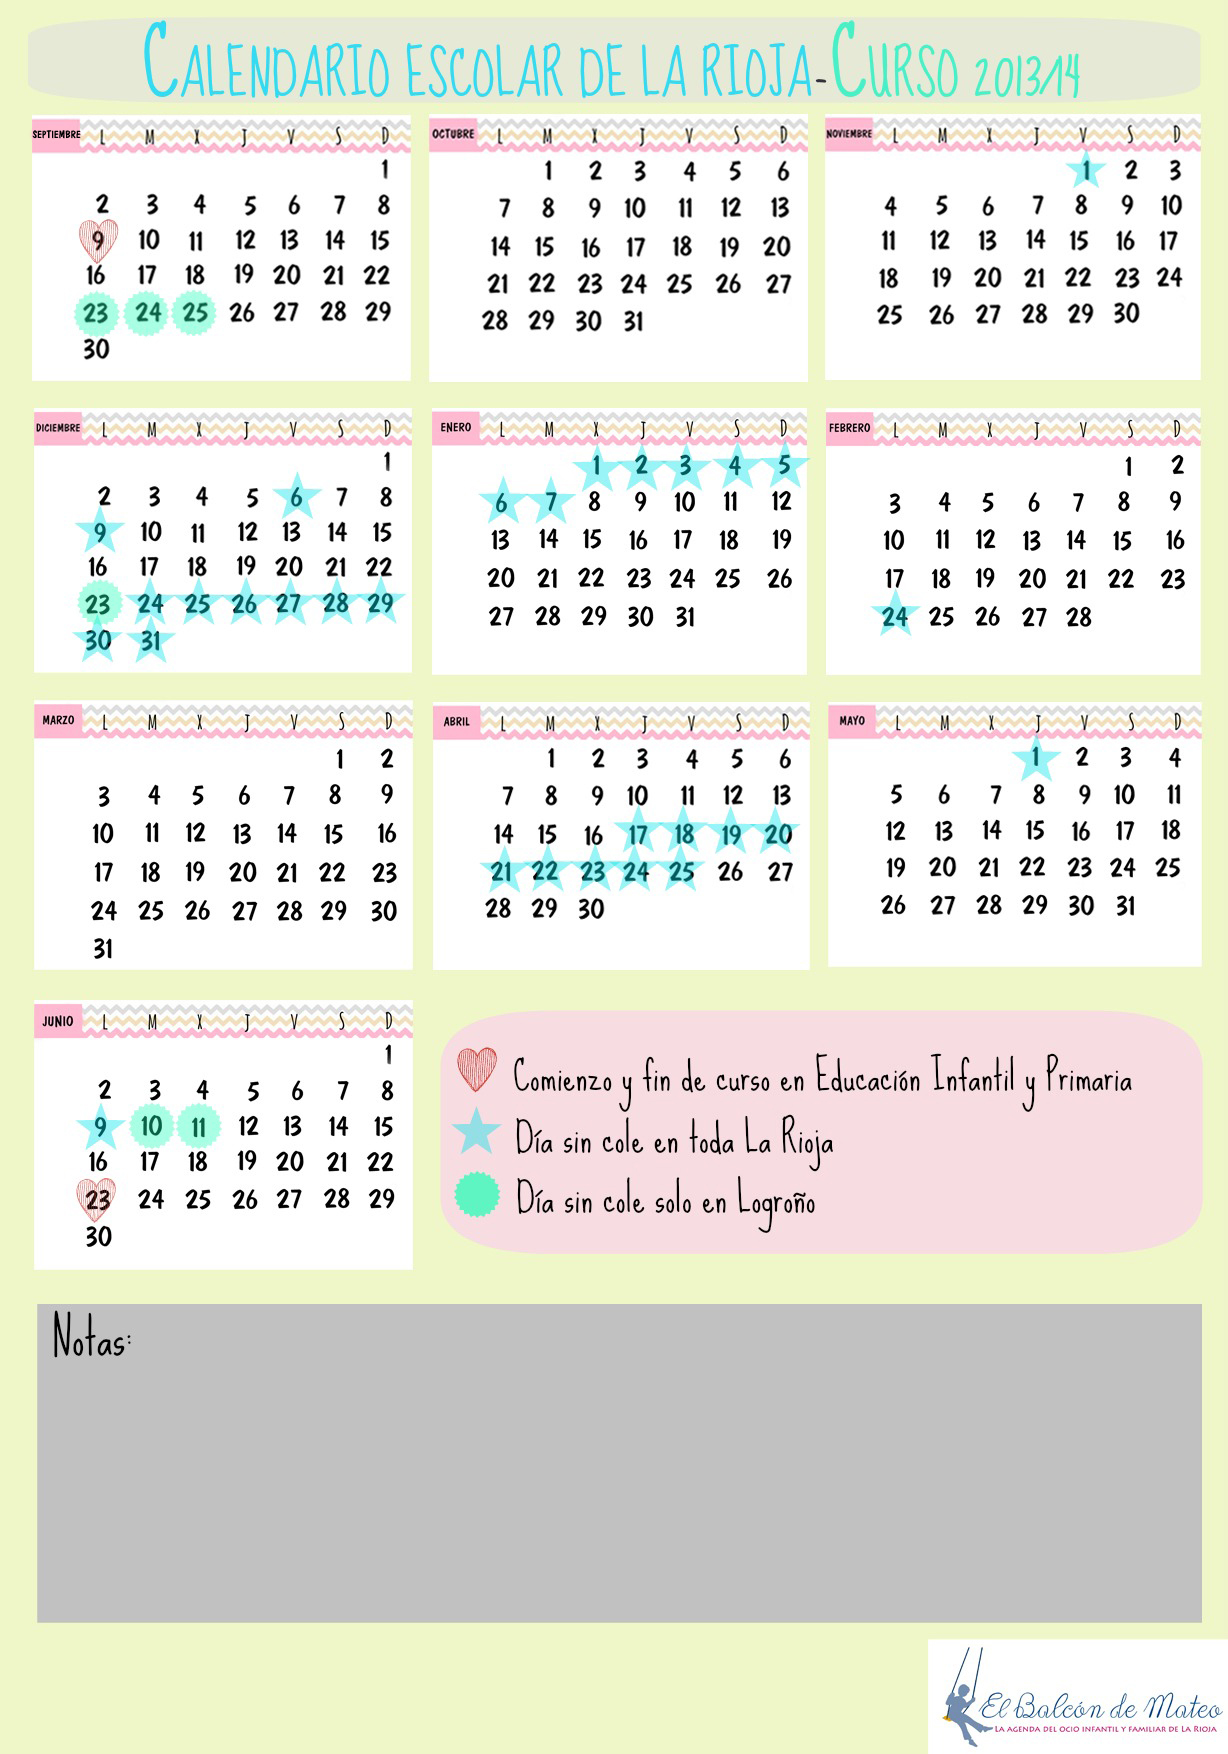 Calendario Escolar La Rioja 2013-2014